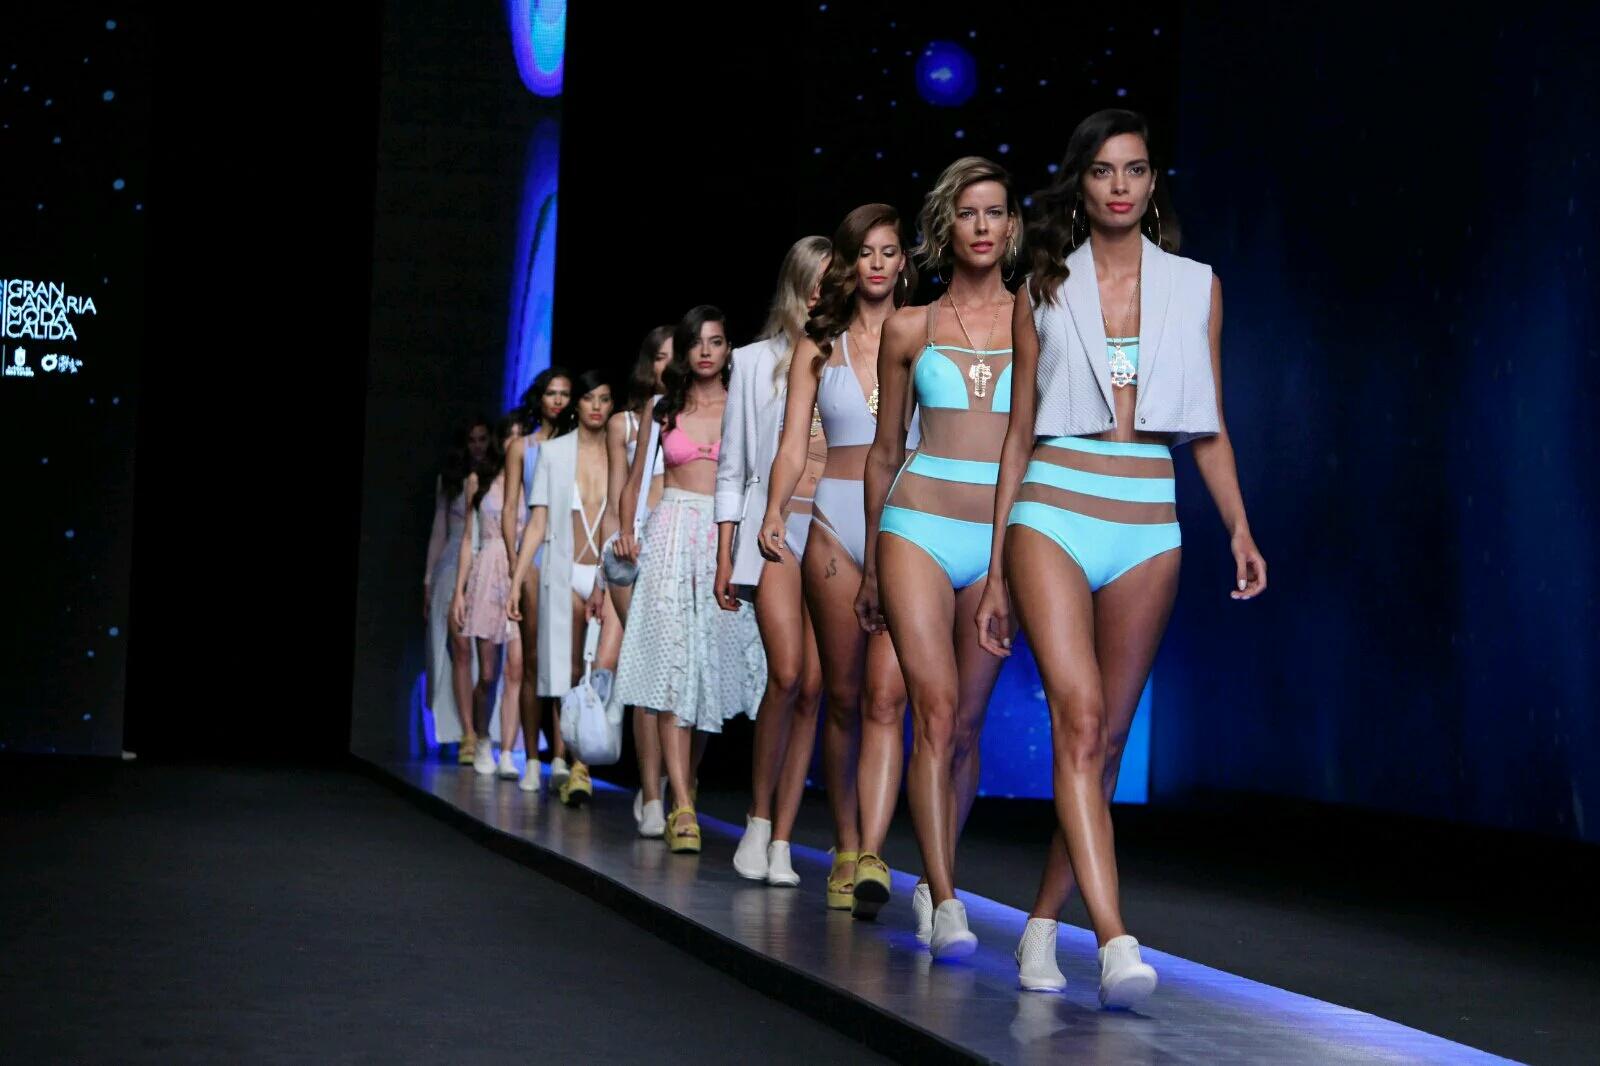 Gran Canaria Swimwear Fashion Week desvela los participantes